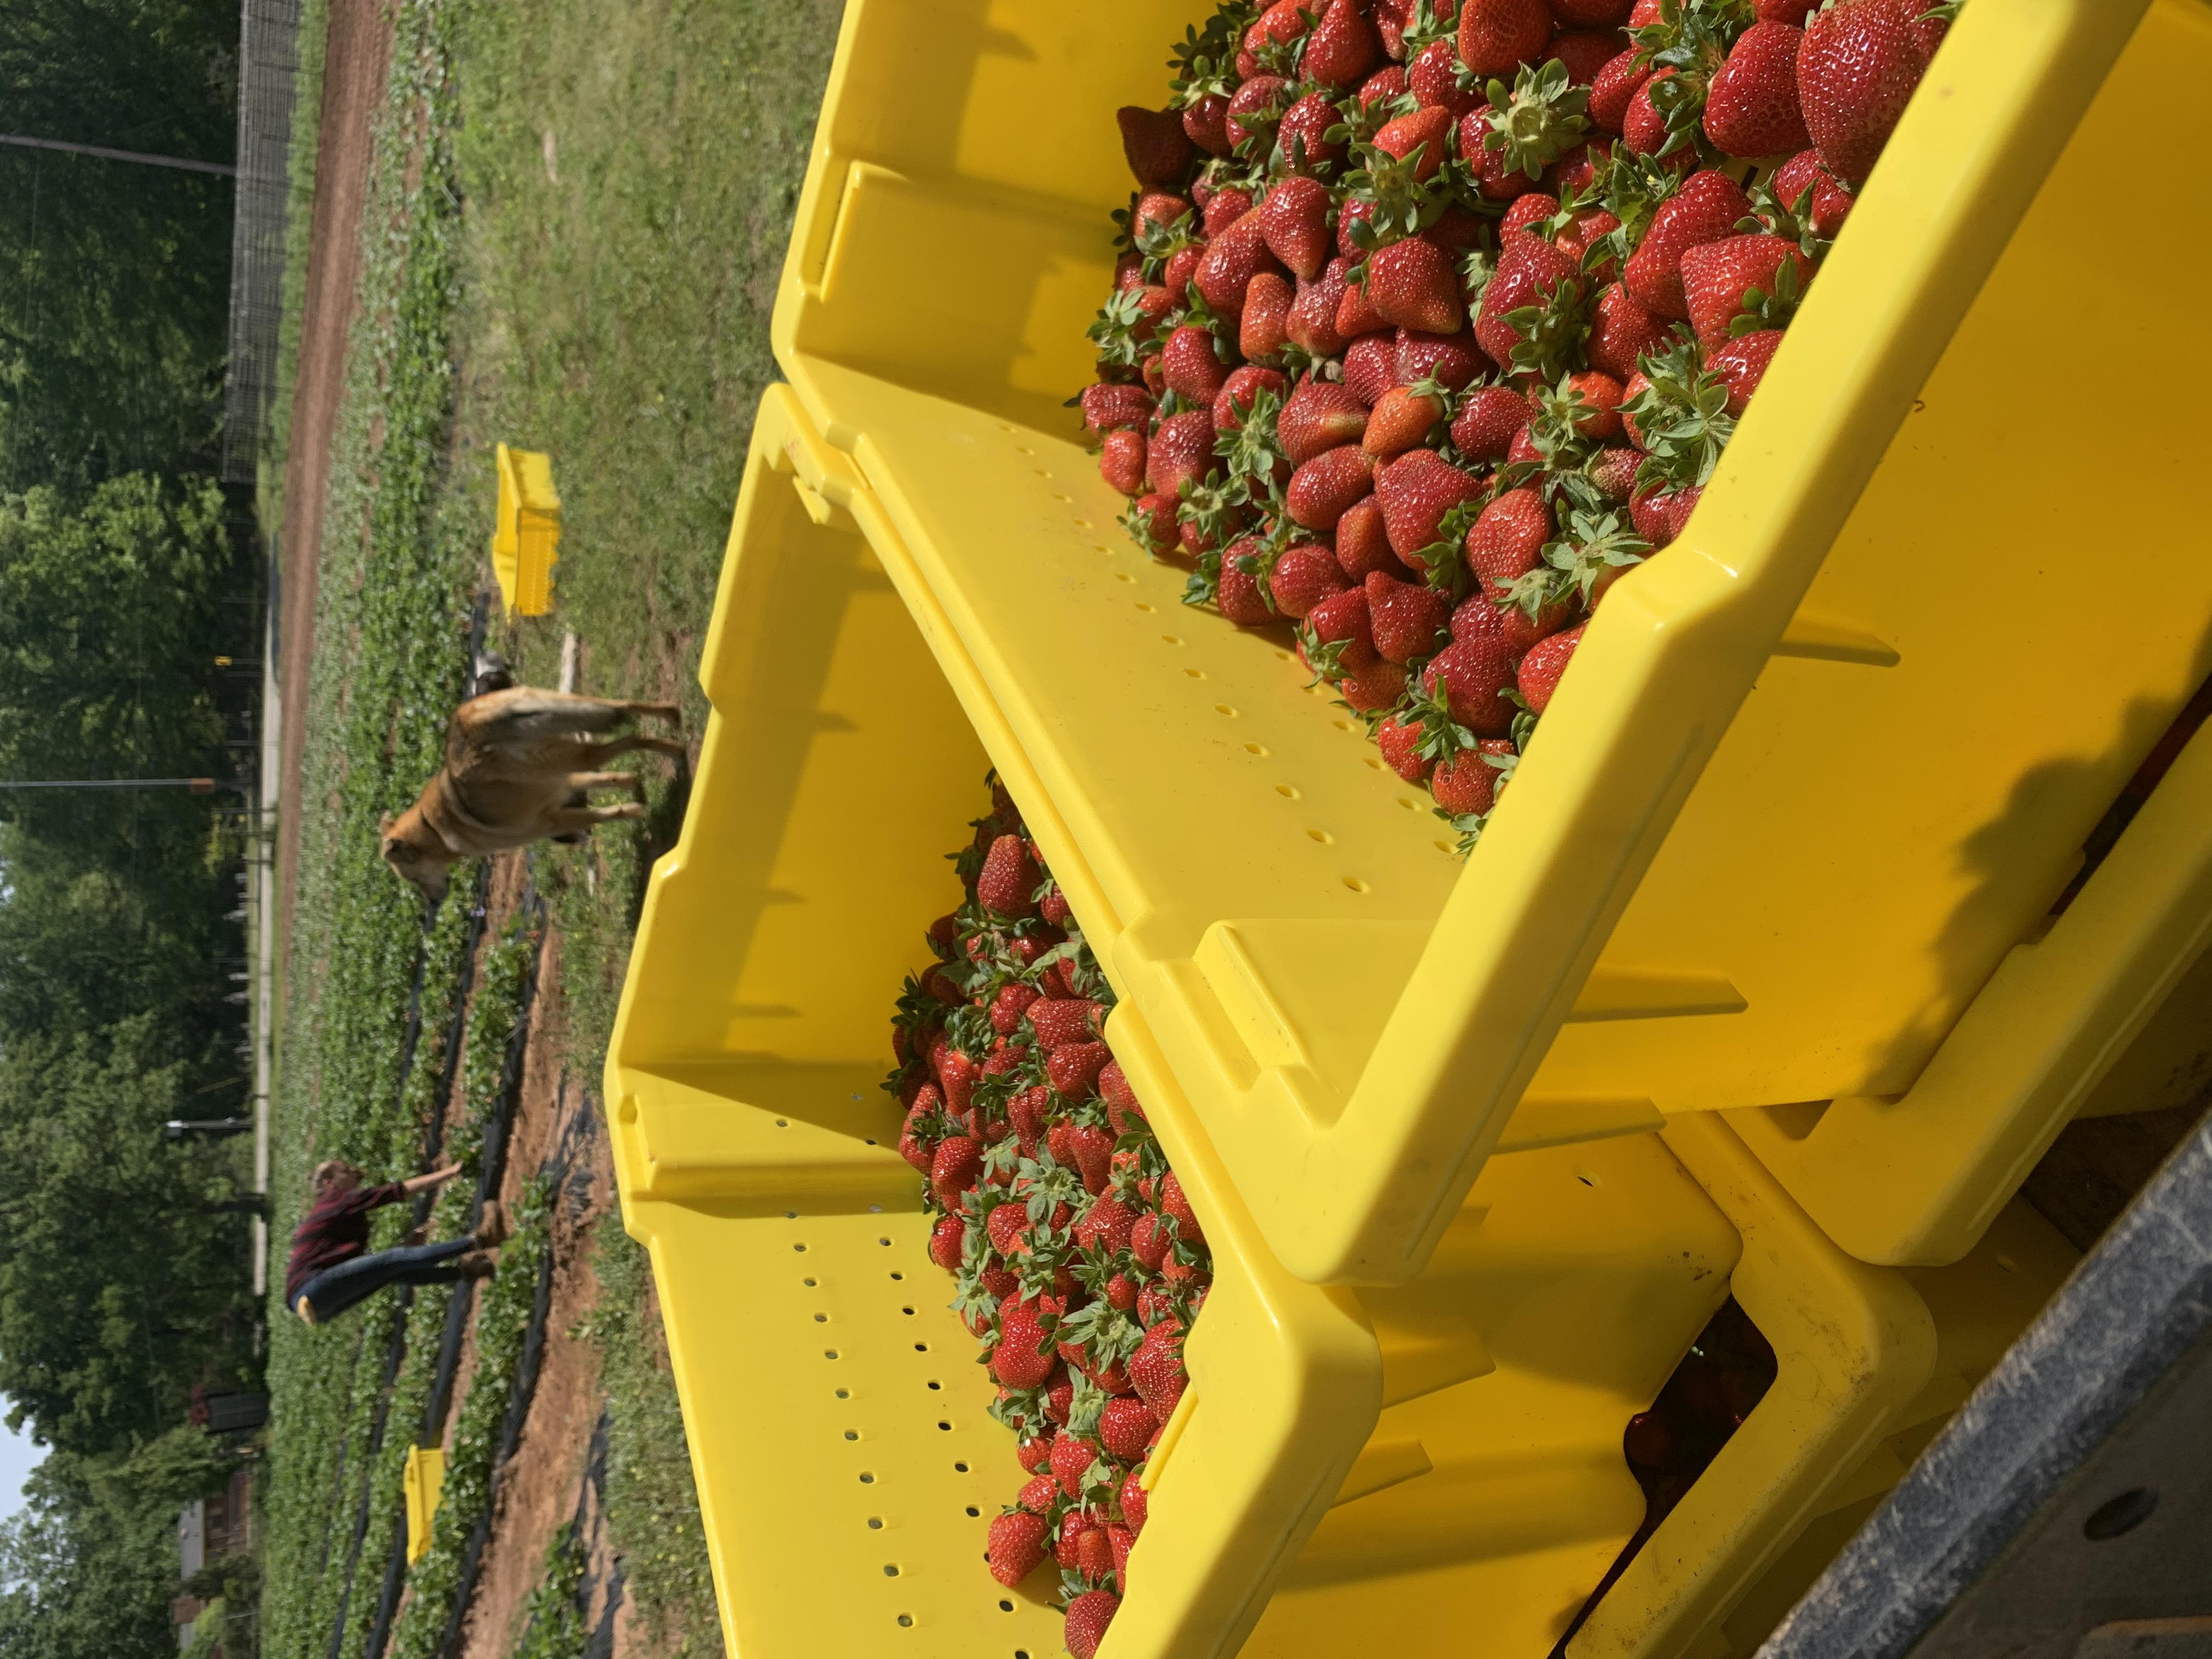 Farm Happenings for April 29, 2020